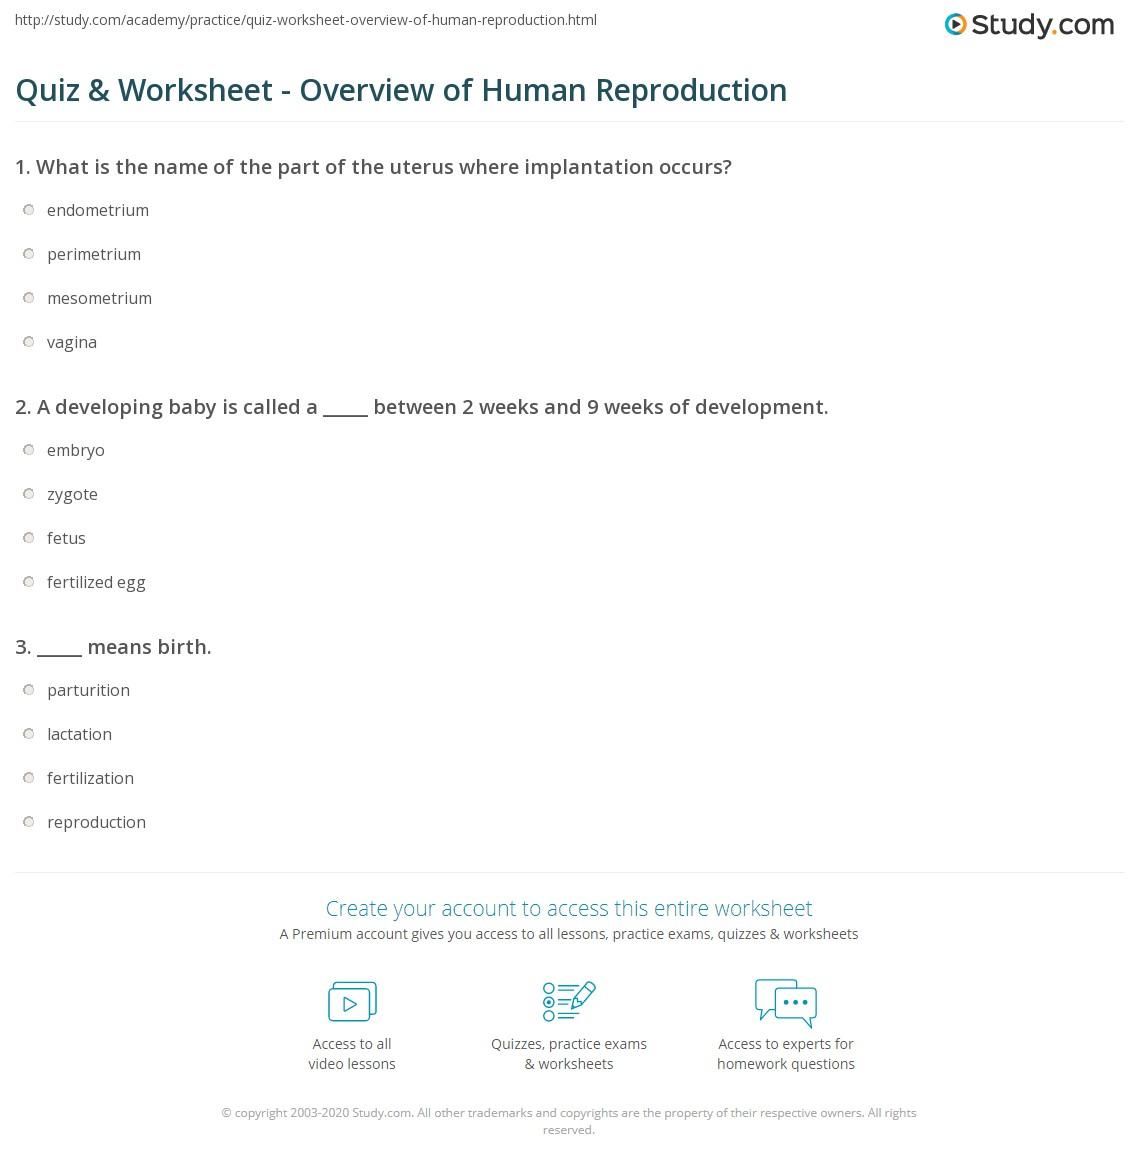 Worksheets Human Reproduction Worksheet quiz worksheet overview of human reproduction study com print worksheet